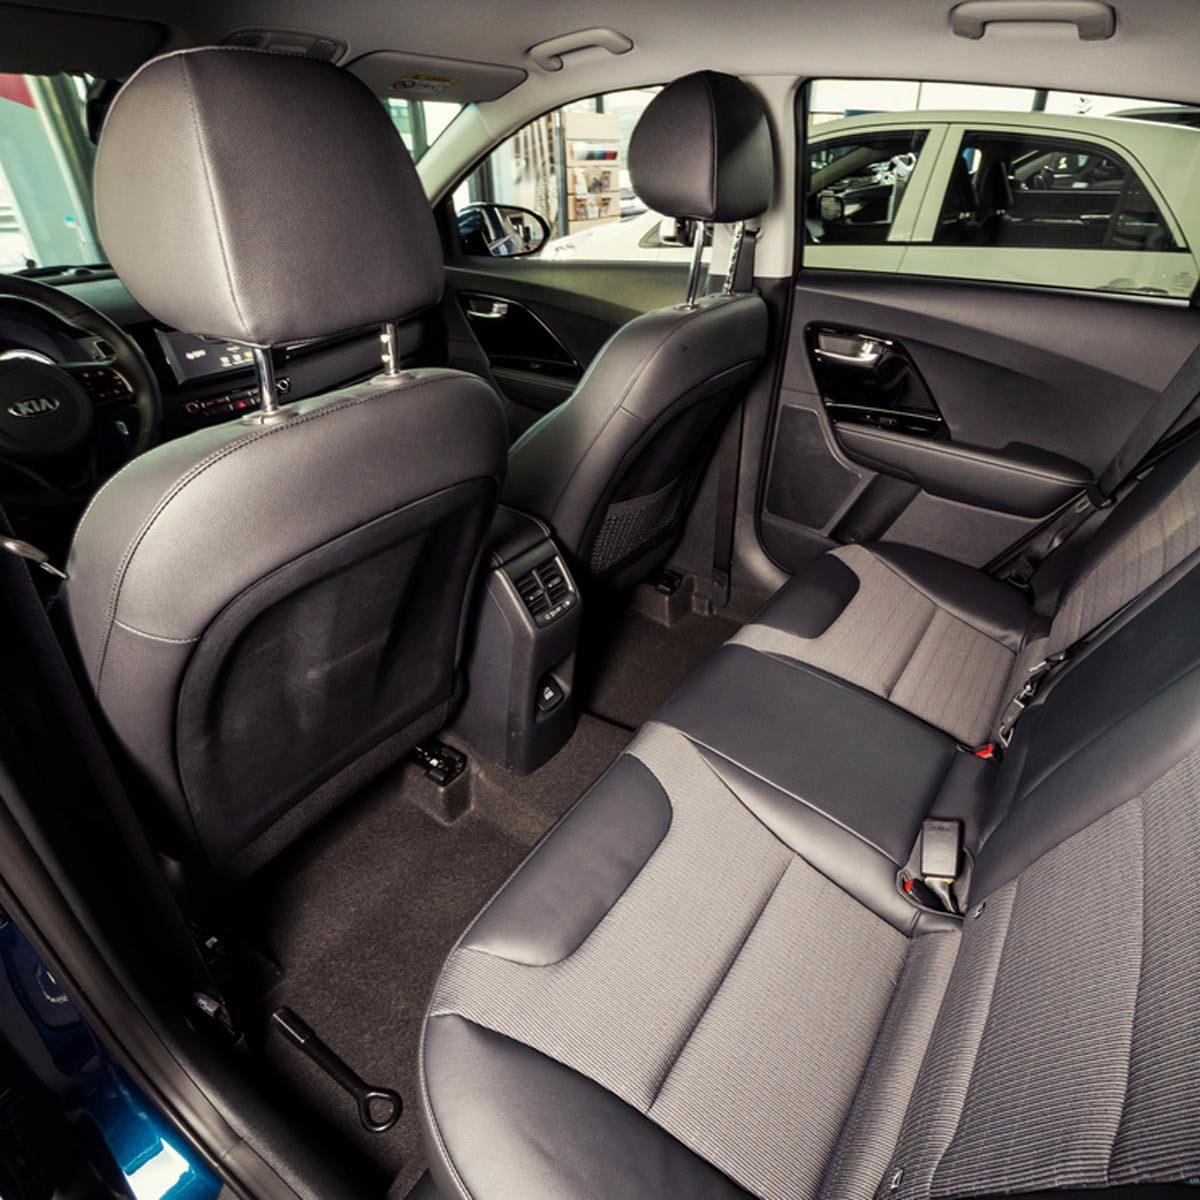 shutterstock_584388298 interior backseat of car